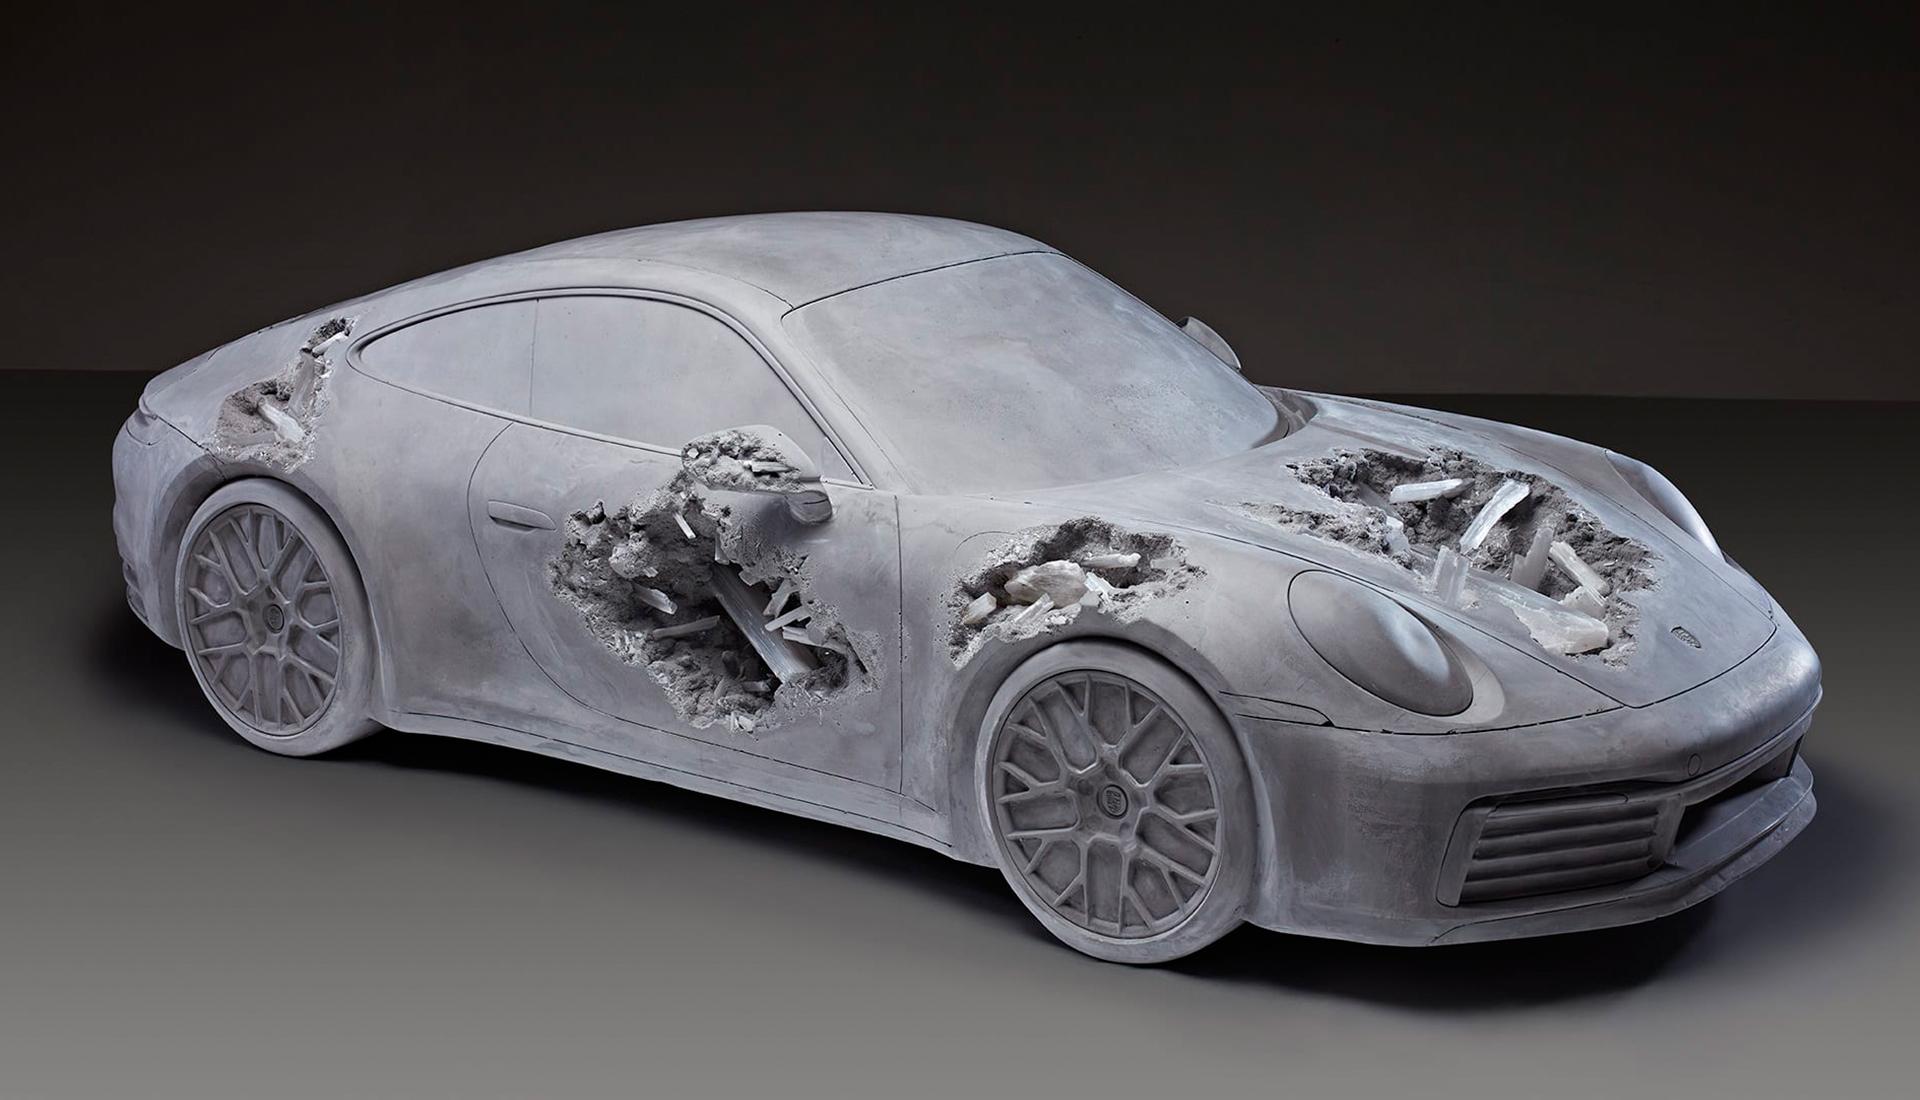 Разрушенный Porsche Дэниела Аршама